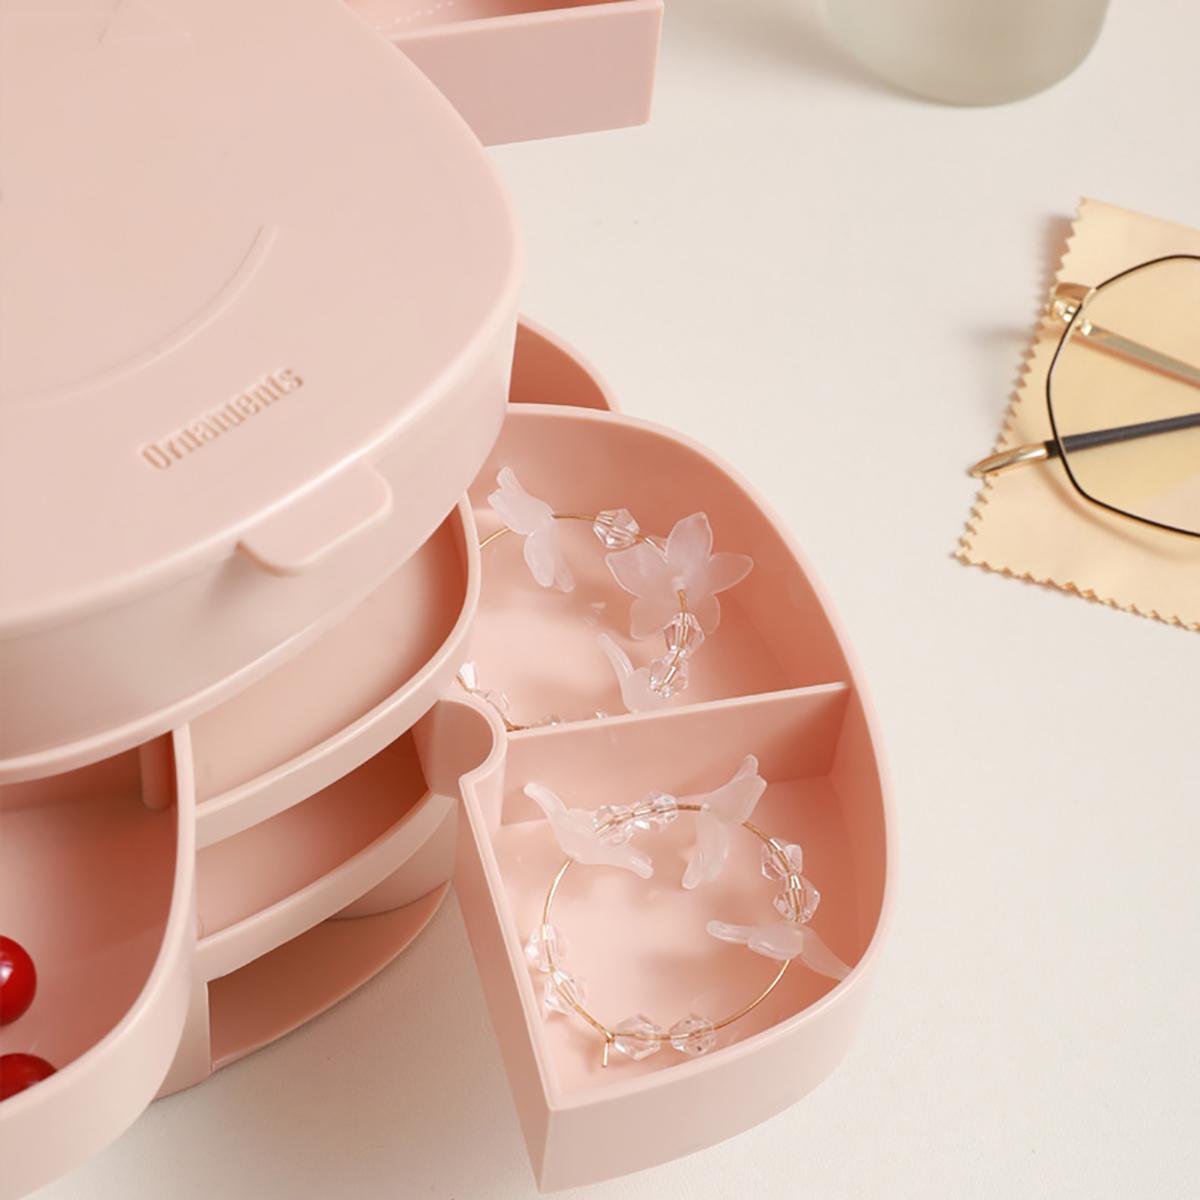 4 Layers Jewelry Storage Box Rotating Cosmetic Storage Box Desktop Storage Boxes Birthday Gift for Girls